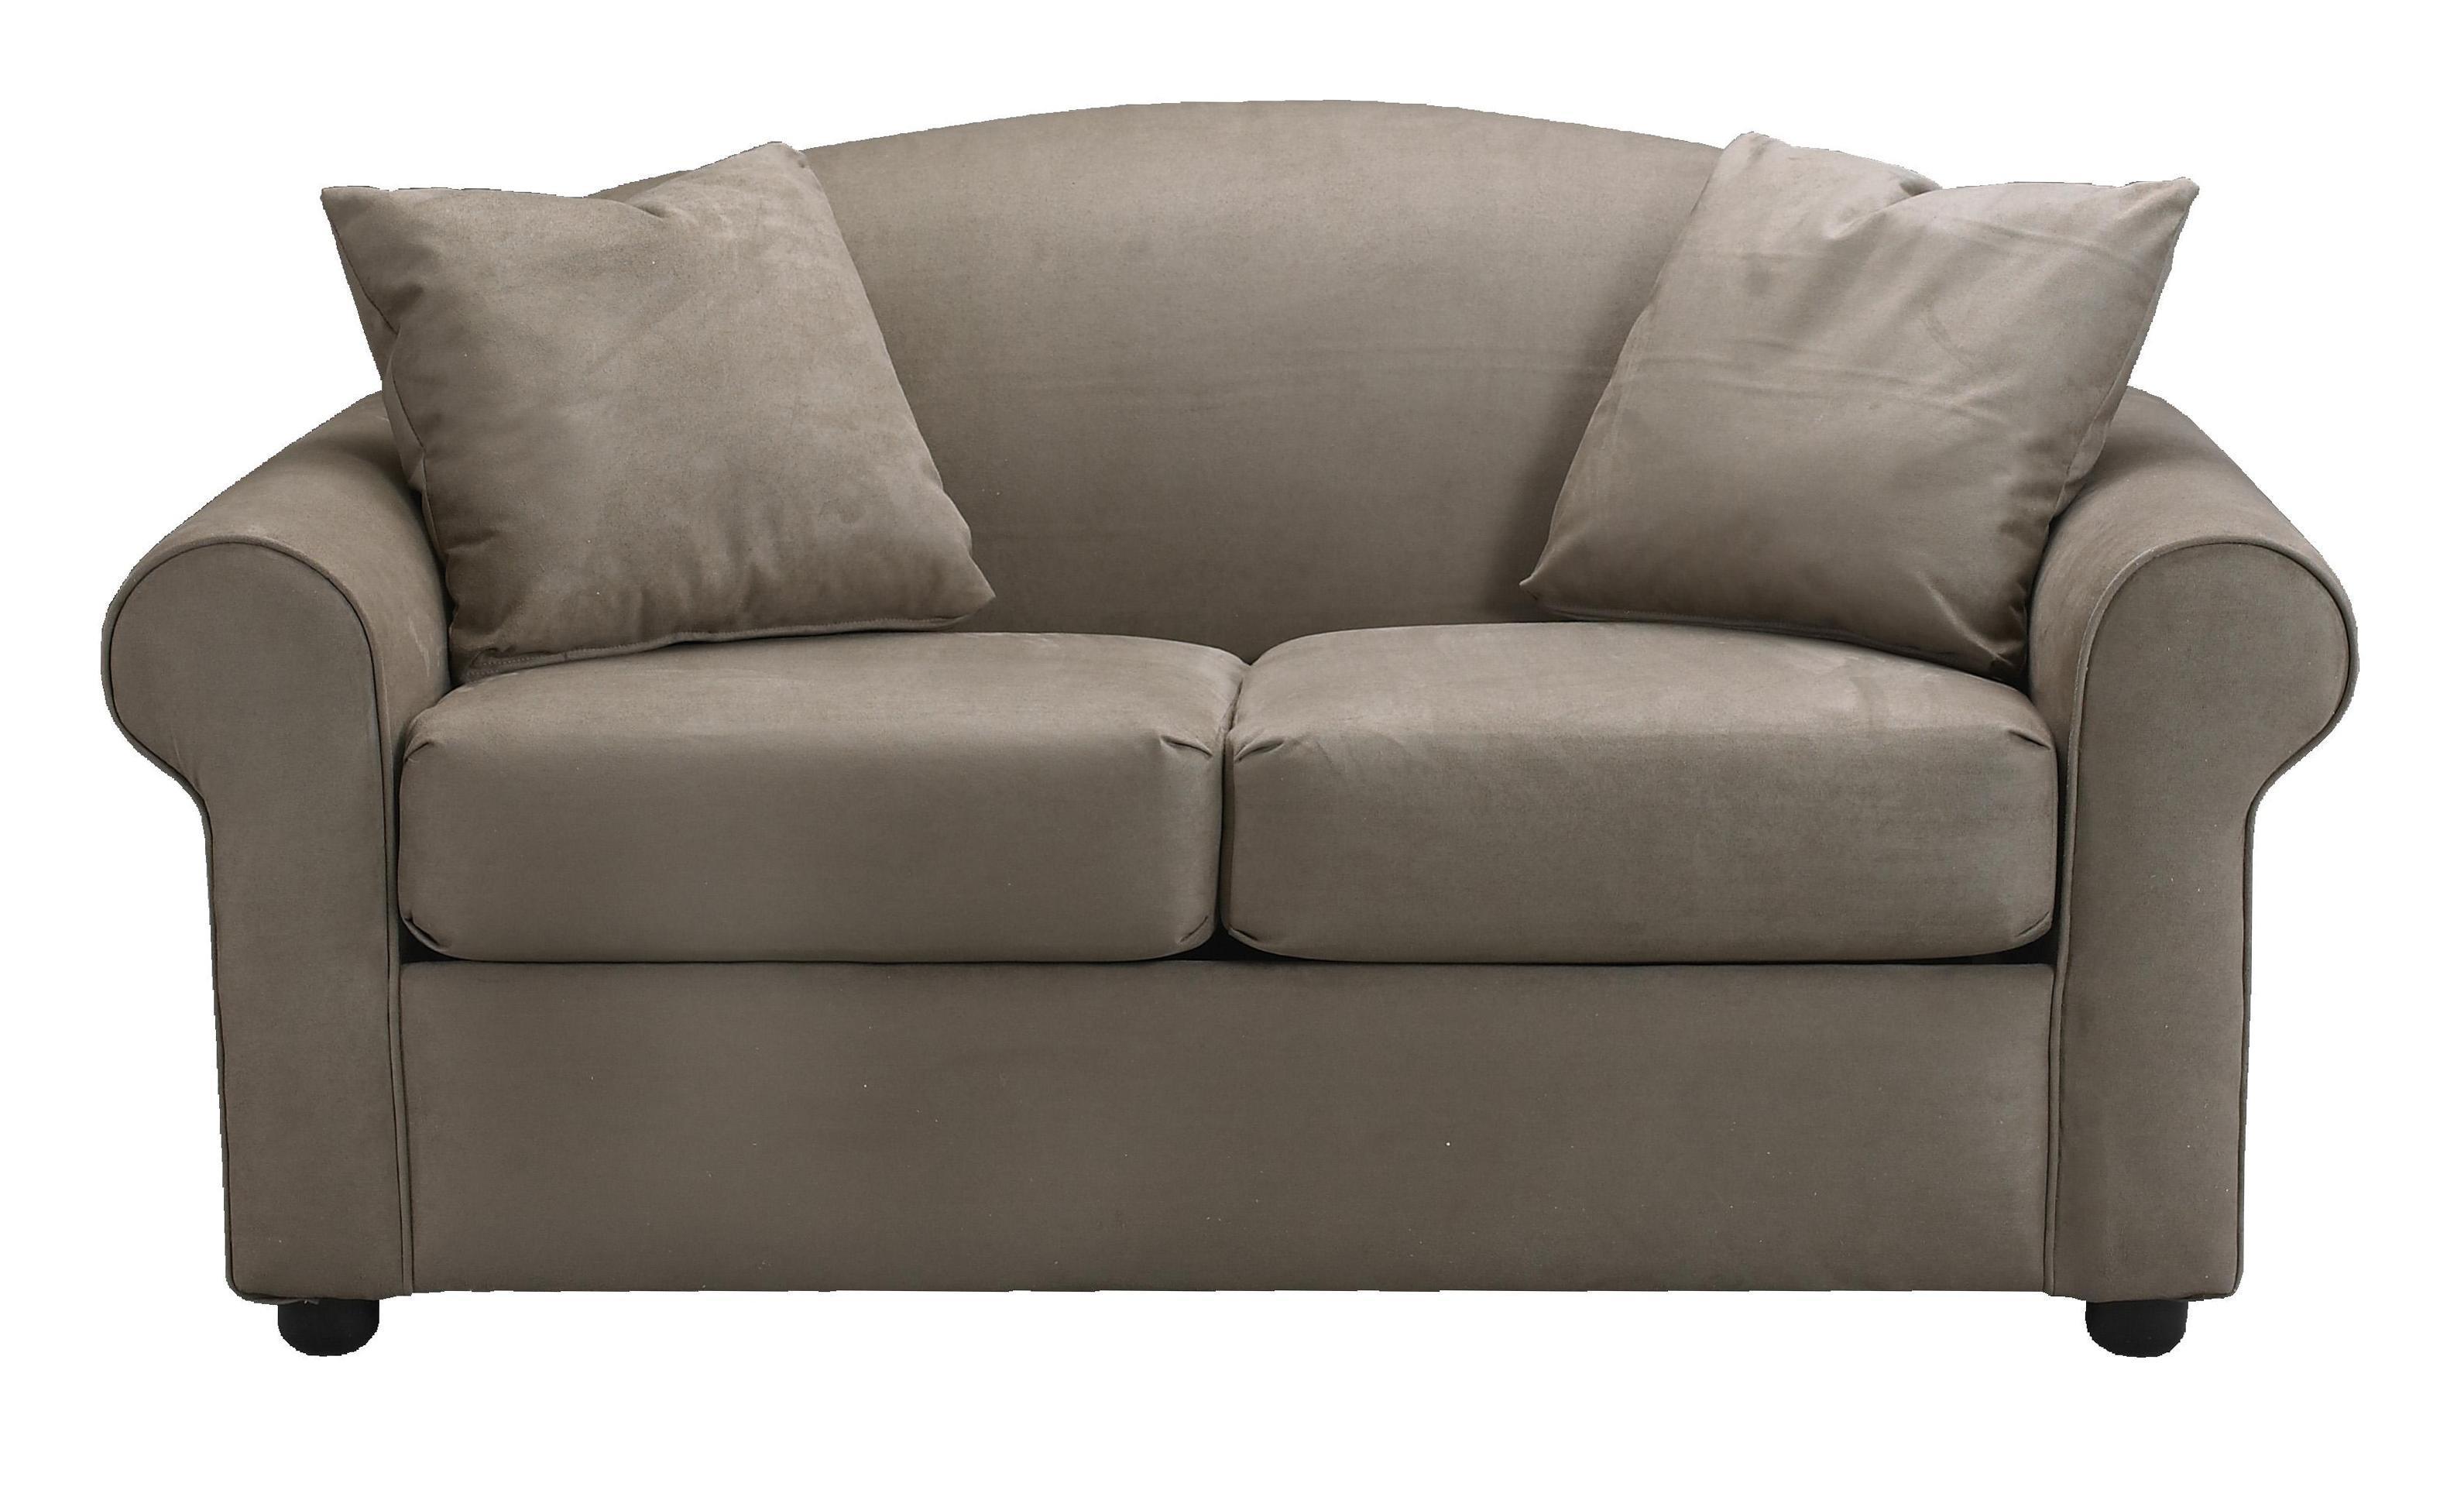 Sofa Couch Loveseat Sleeper | Fonky Pertaining To Denim Loveseats (Image 17 of 20)